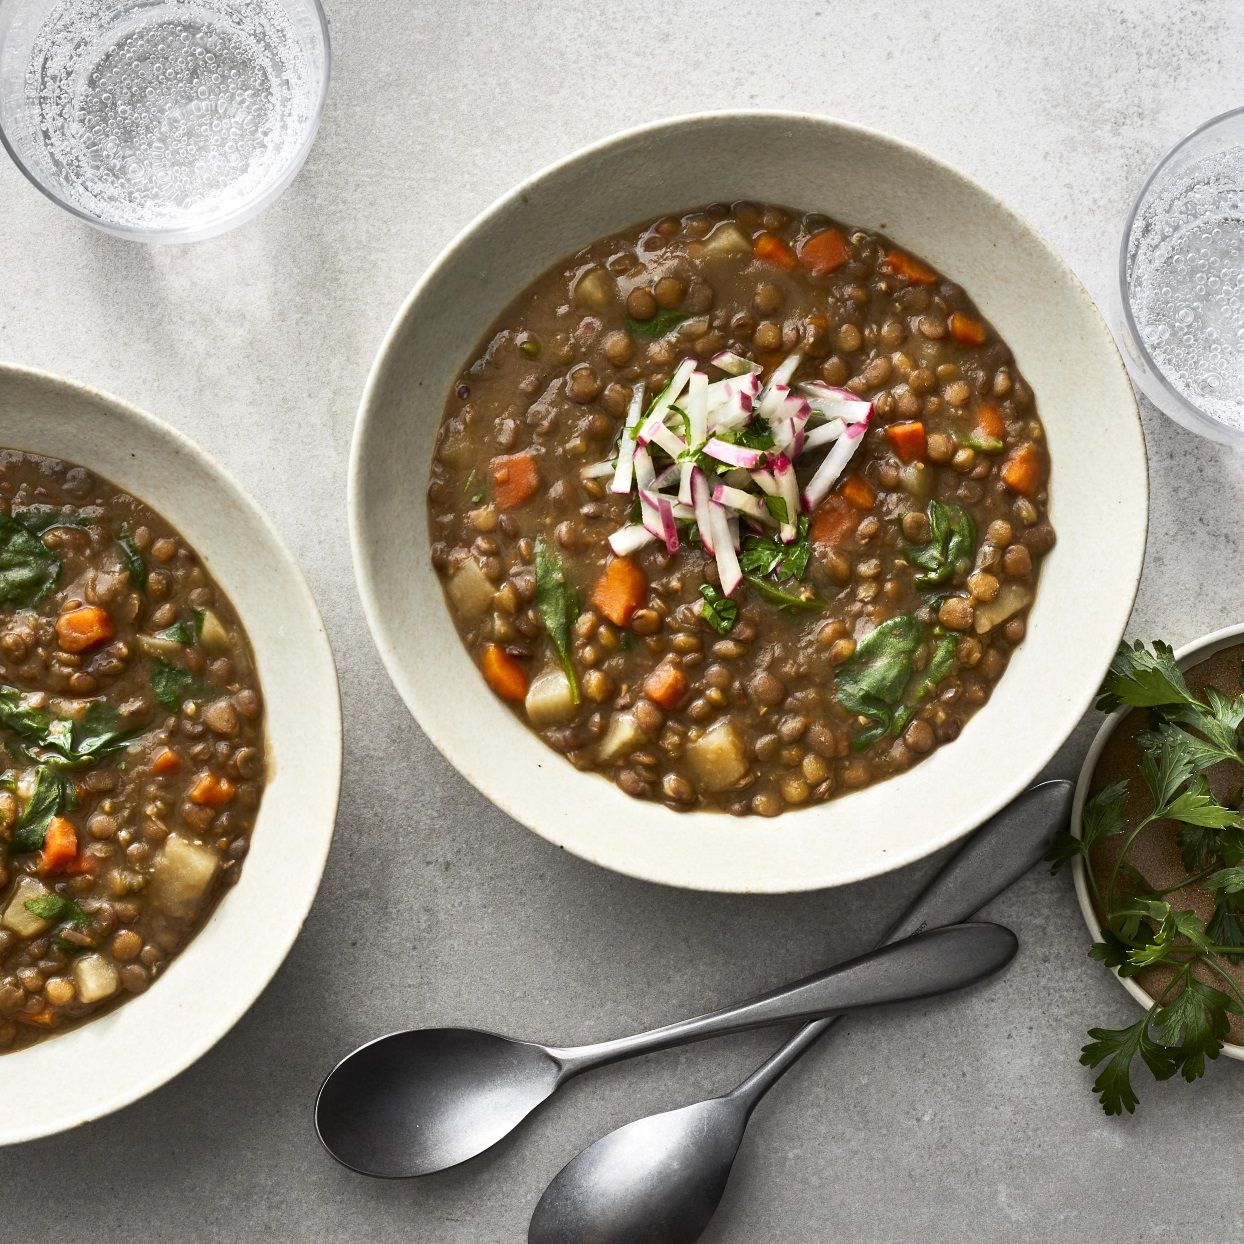 a2a047d0b62817522e8180679e4442db - Chorizo And Lentil Soup Better Homes And Gardens